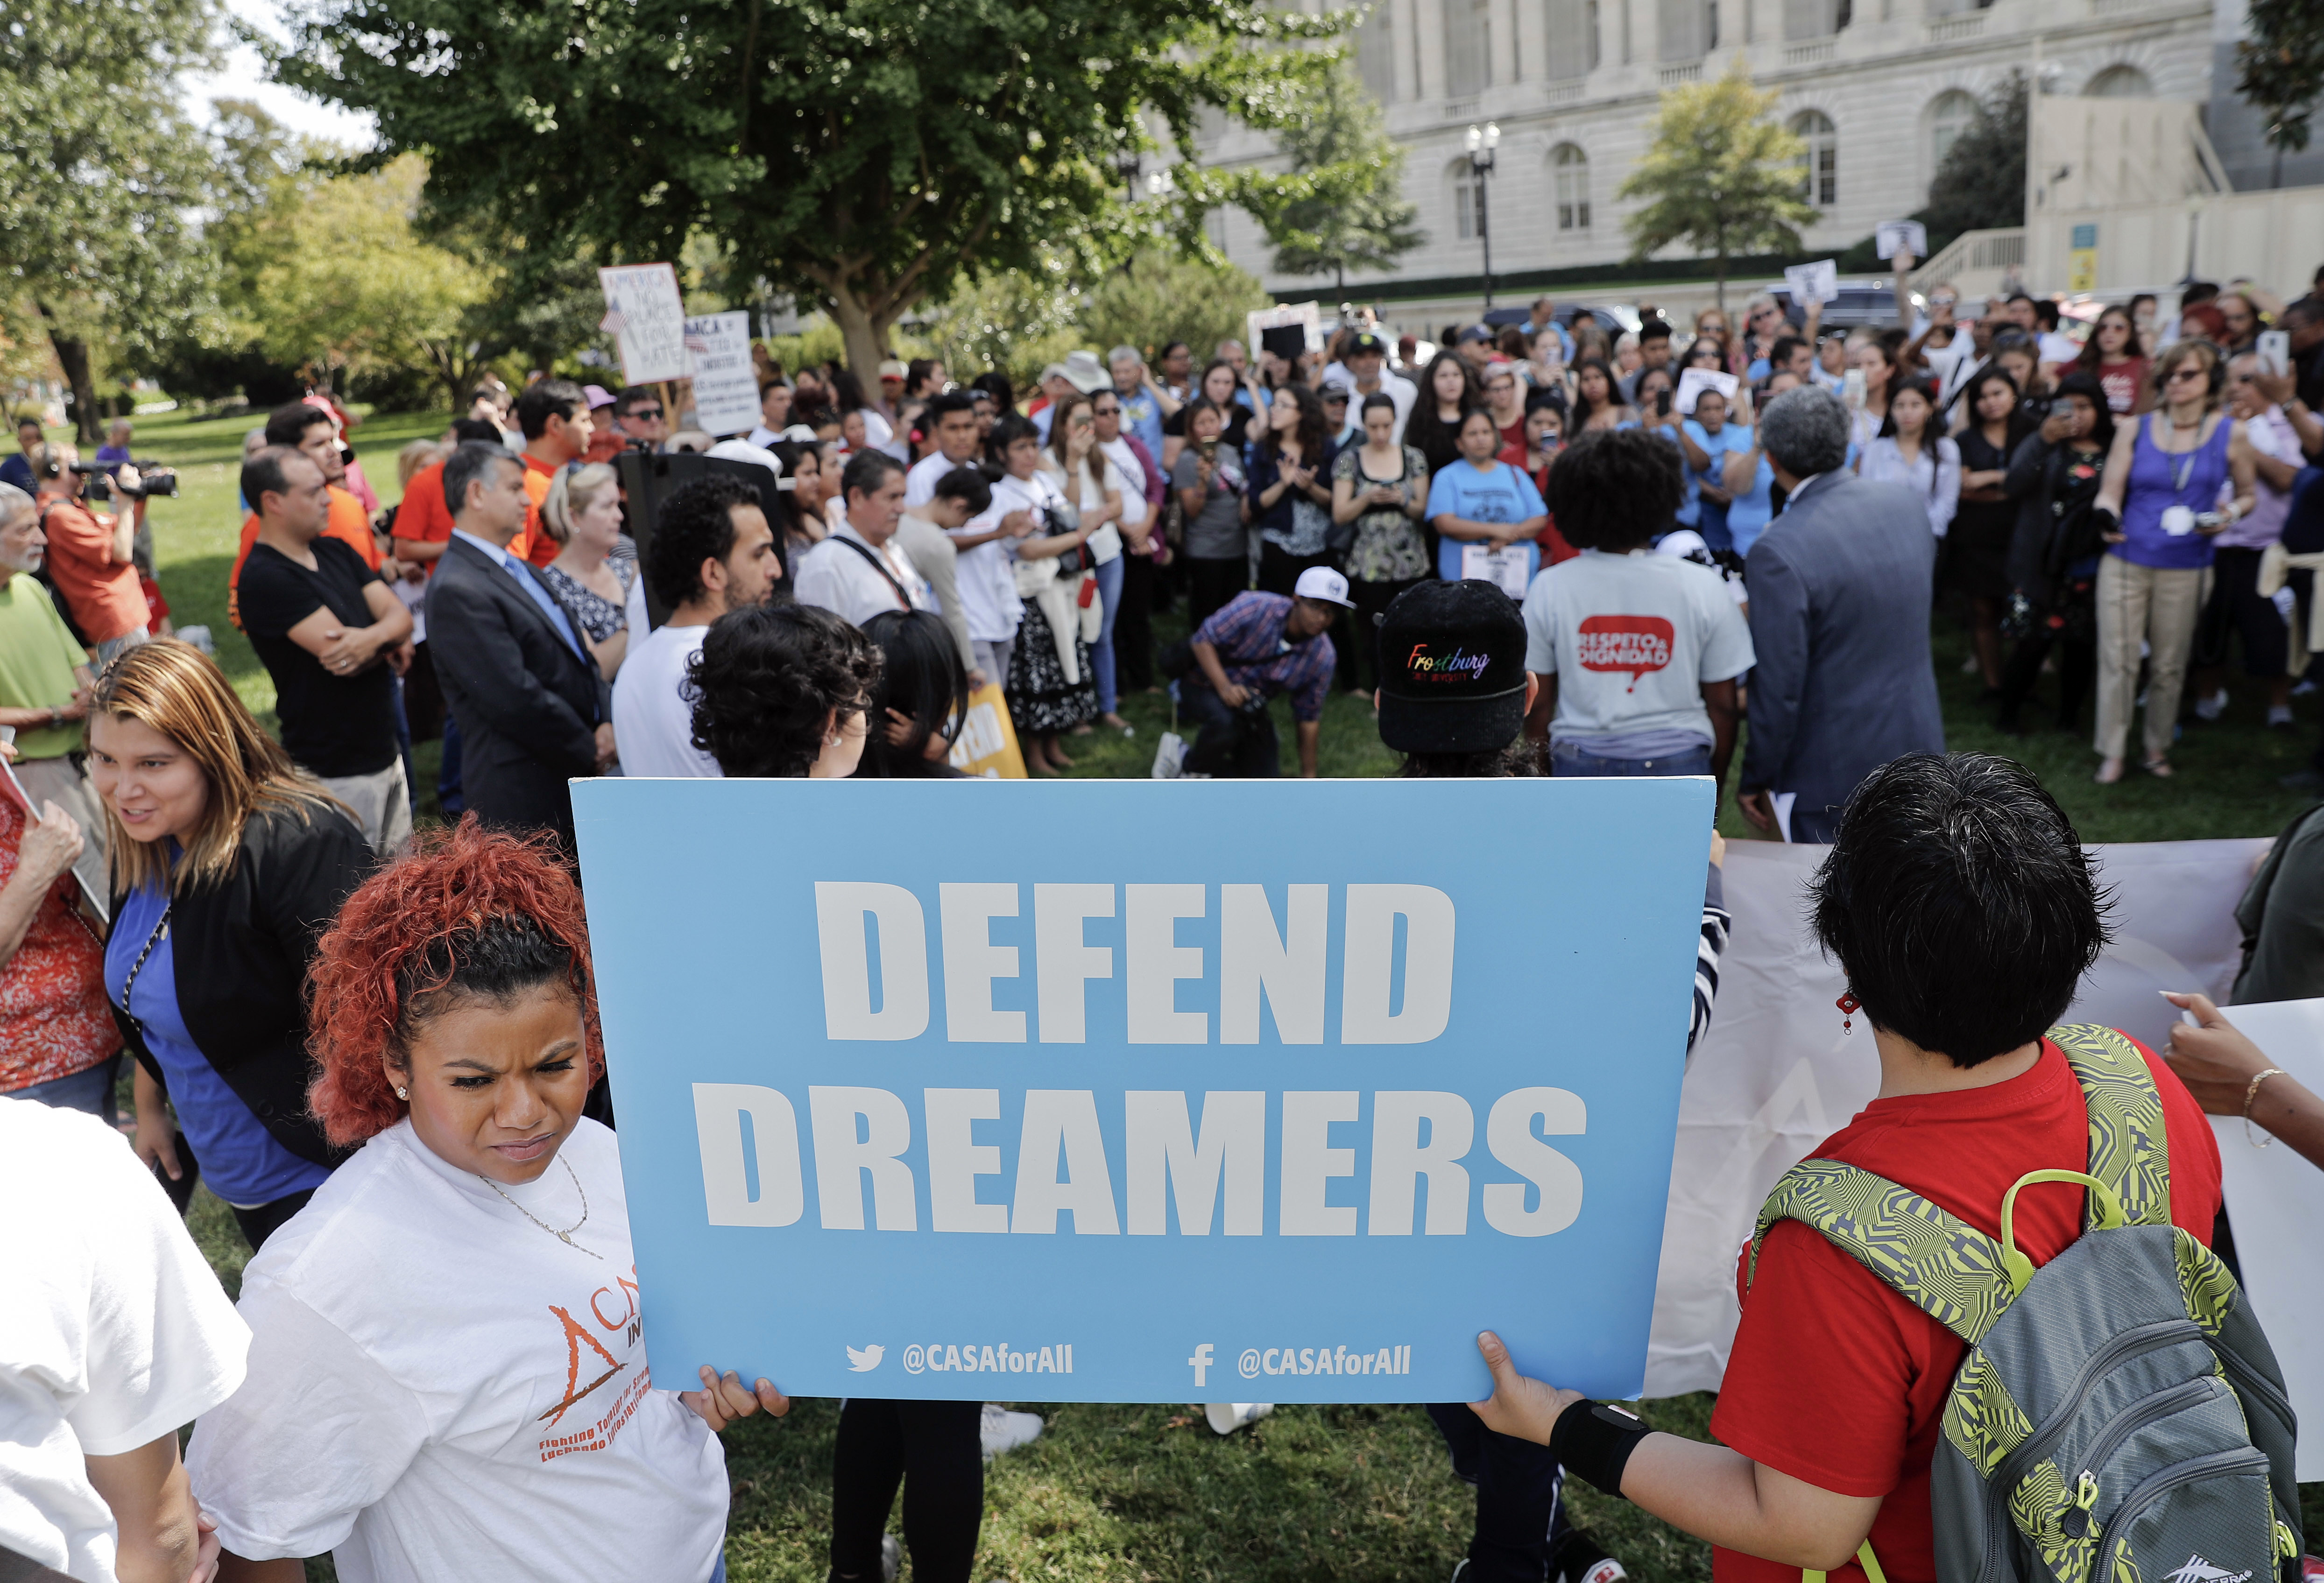 https://twt-media.washtimes.com/media/image/2017/09/26/Congress_Immigration_98524.jpg-08e72.jpg